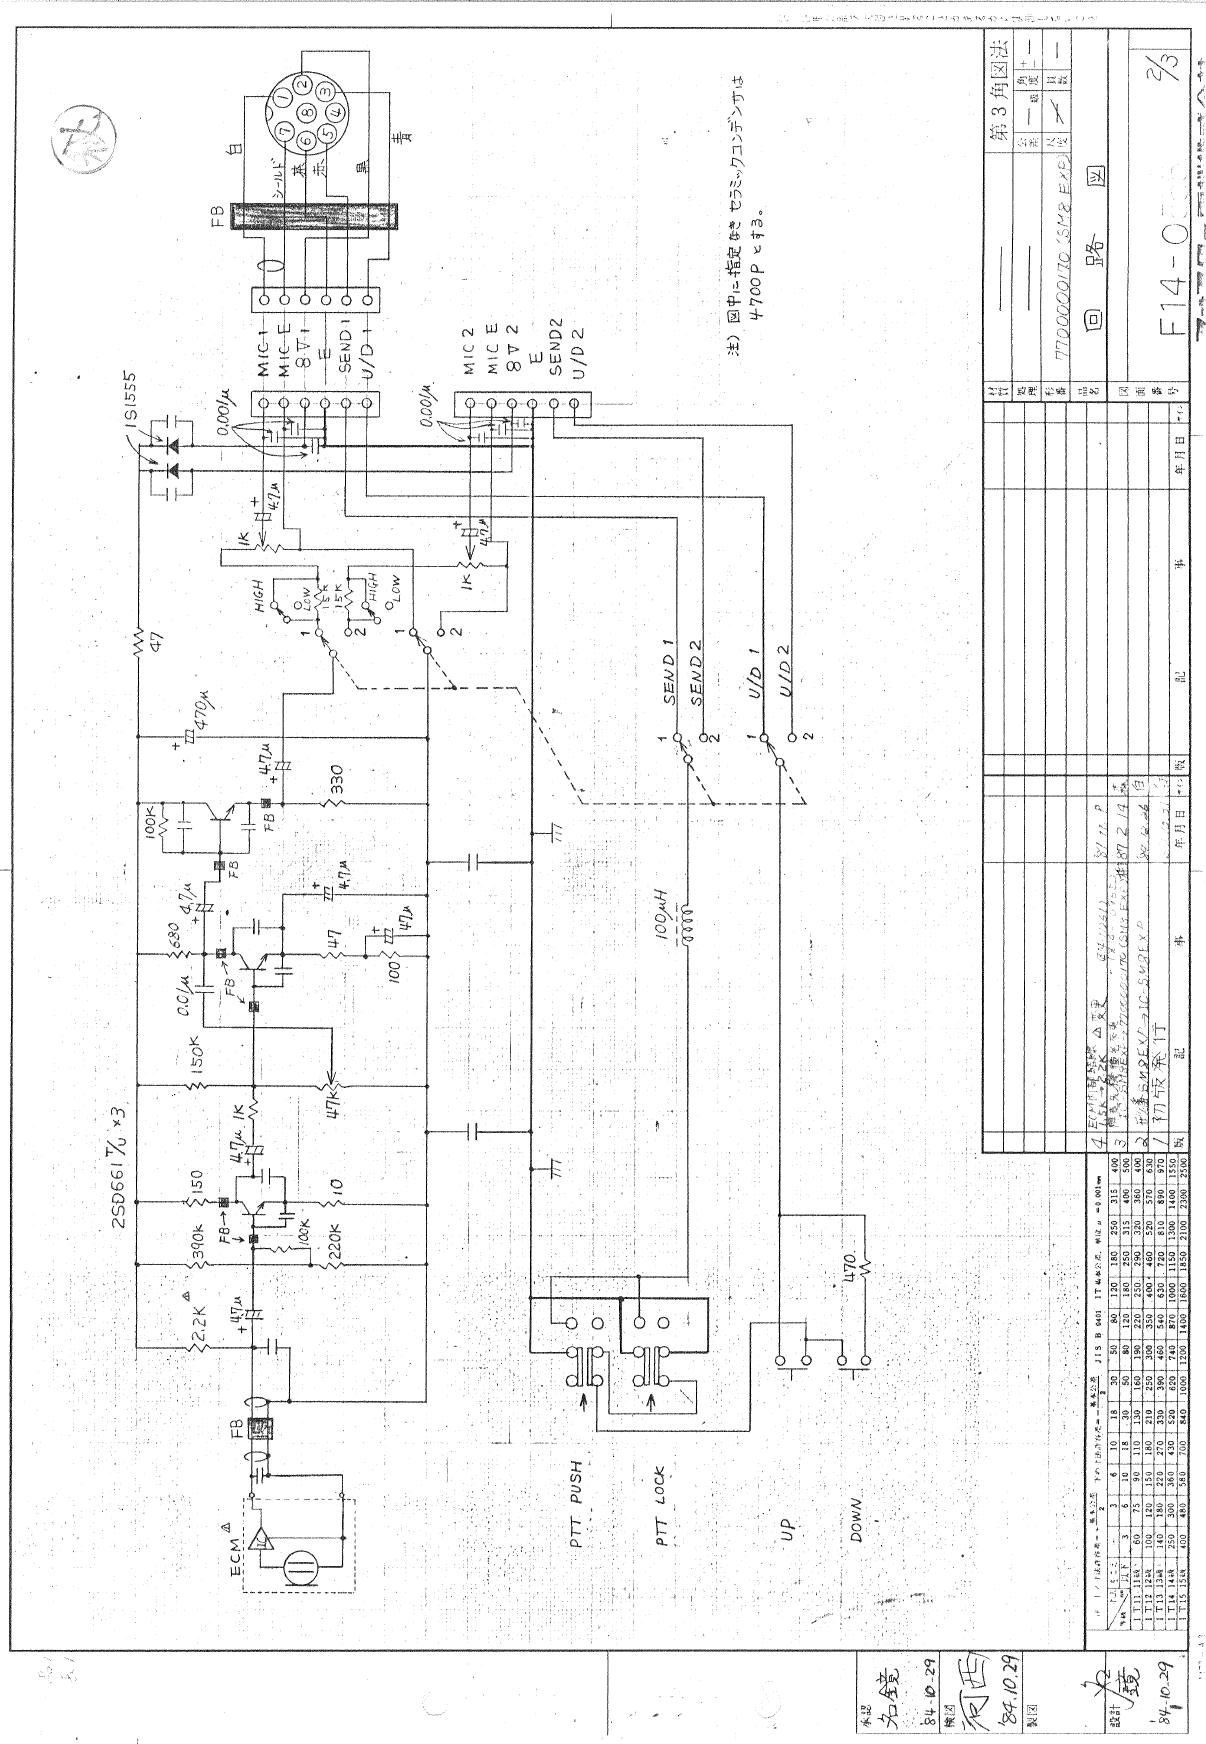 ICOM SM 8 Mic Org Schema Icom Sm Schematic on